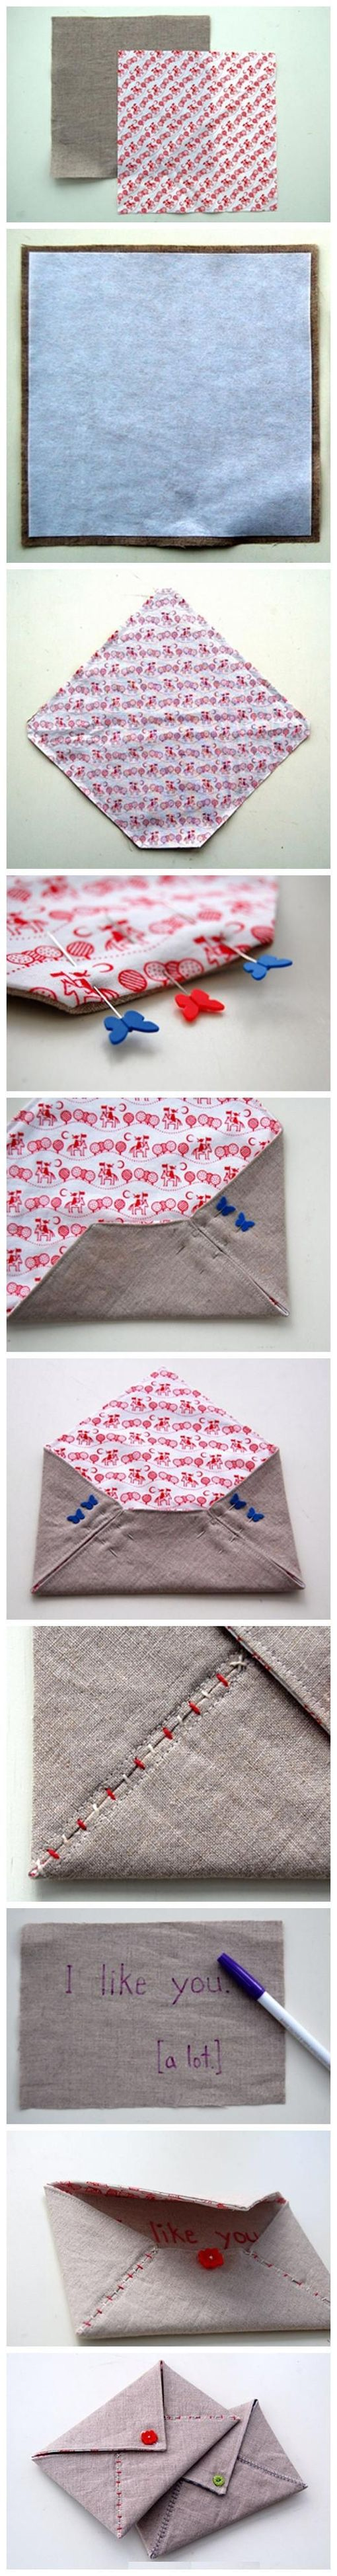 envelope handbag, I guess could be a throw cushion, too